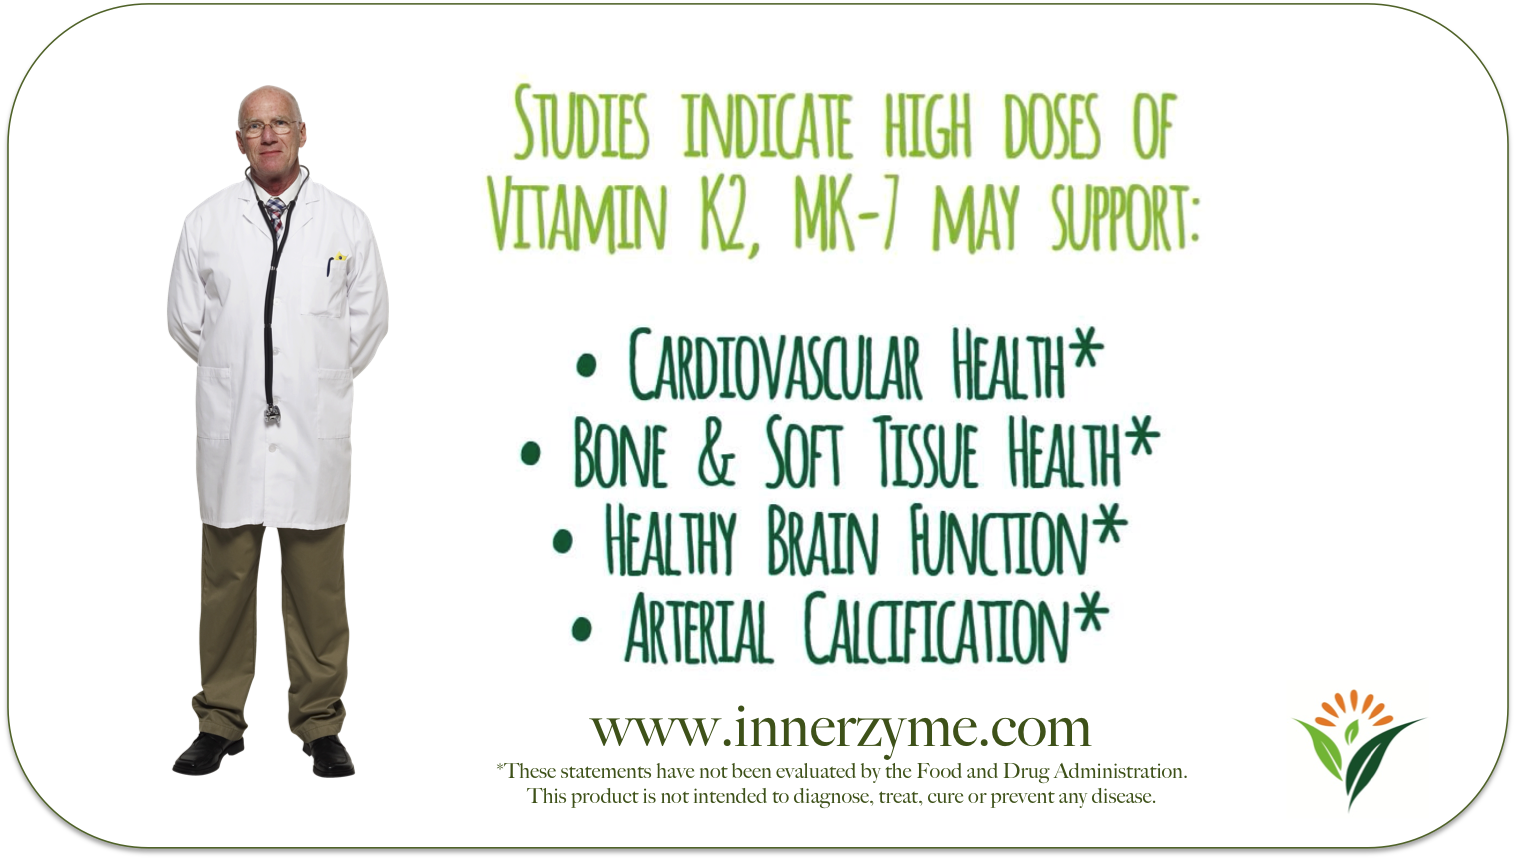 Innerzyme Vitamin K2, MK-7 (300 mcg).  http://www.innerzyme.com/Vitamin_K2_MK-7.html    Natural Form of Vitamin K2, MK-7!